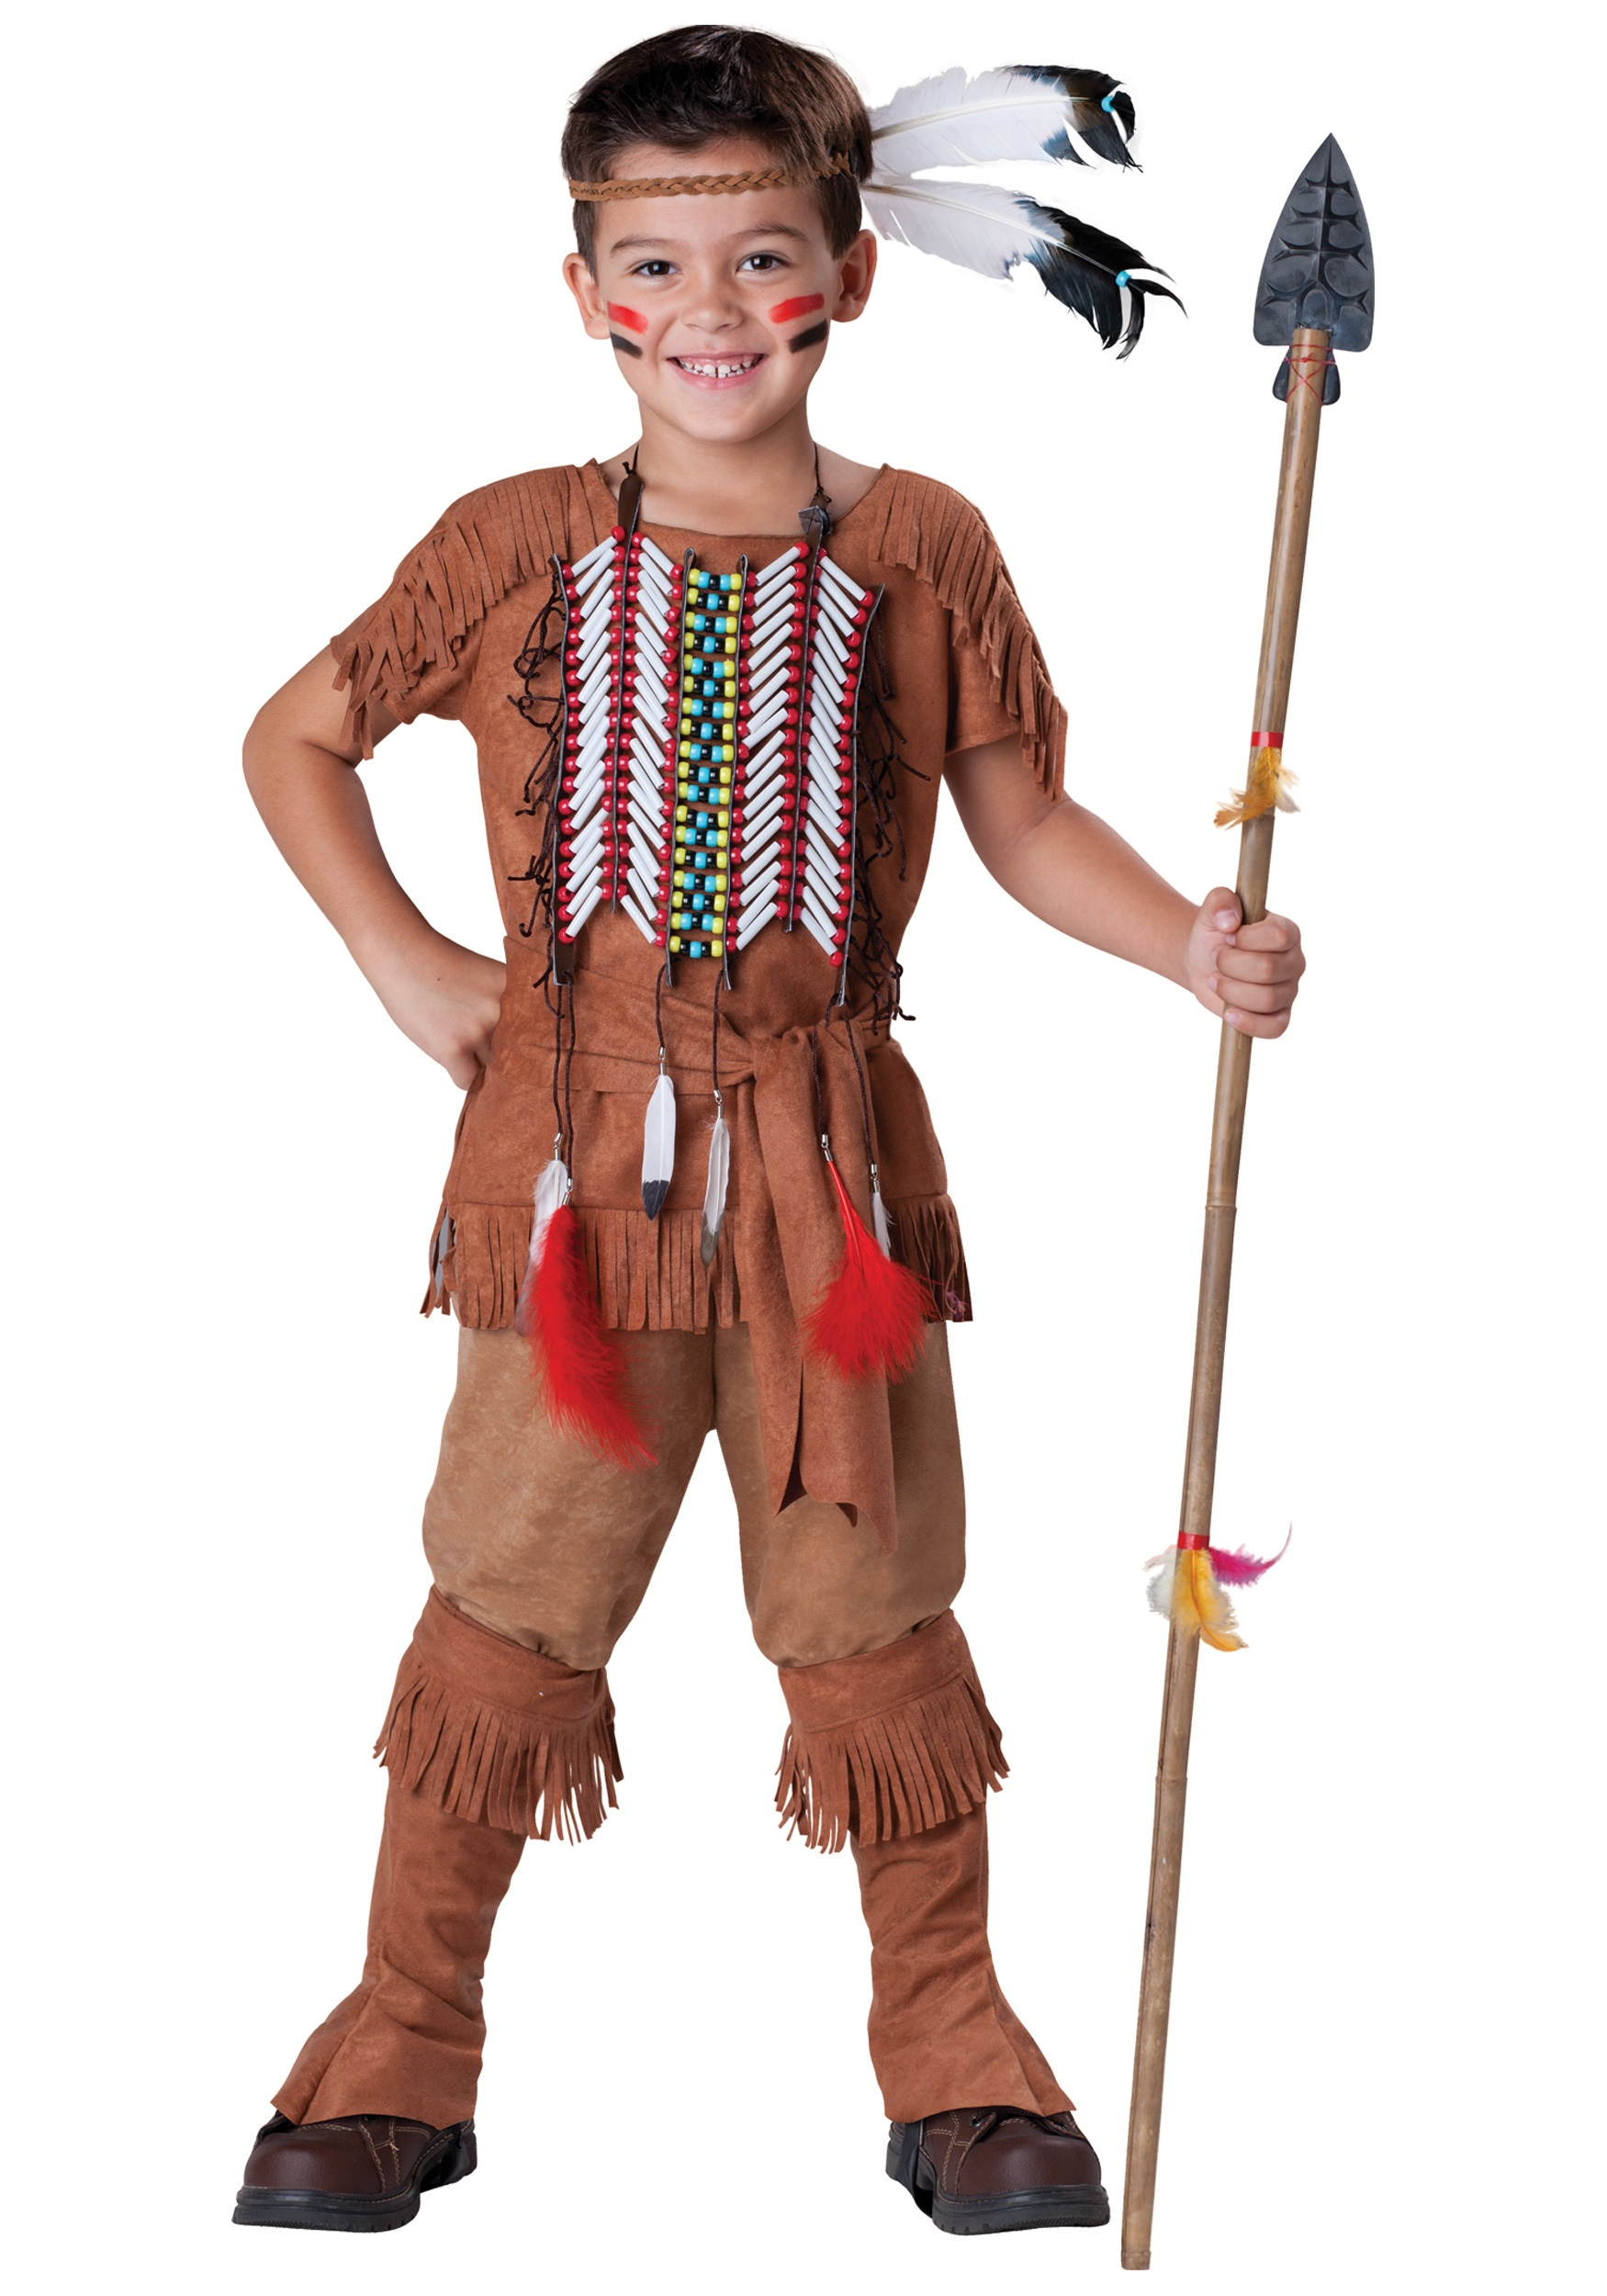 Костюм индейца для мальчика новогодний своими руками